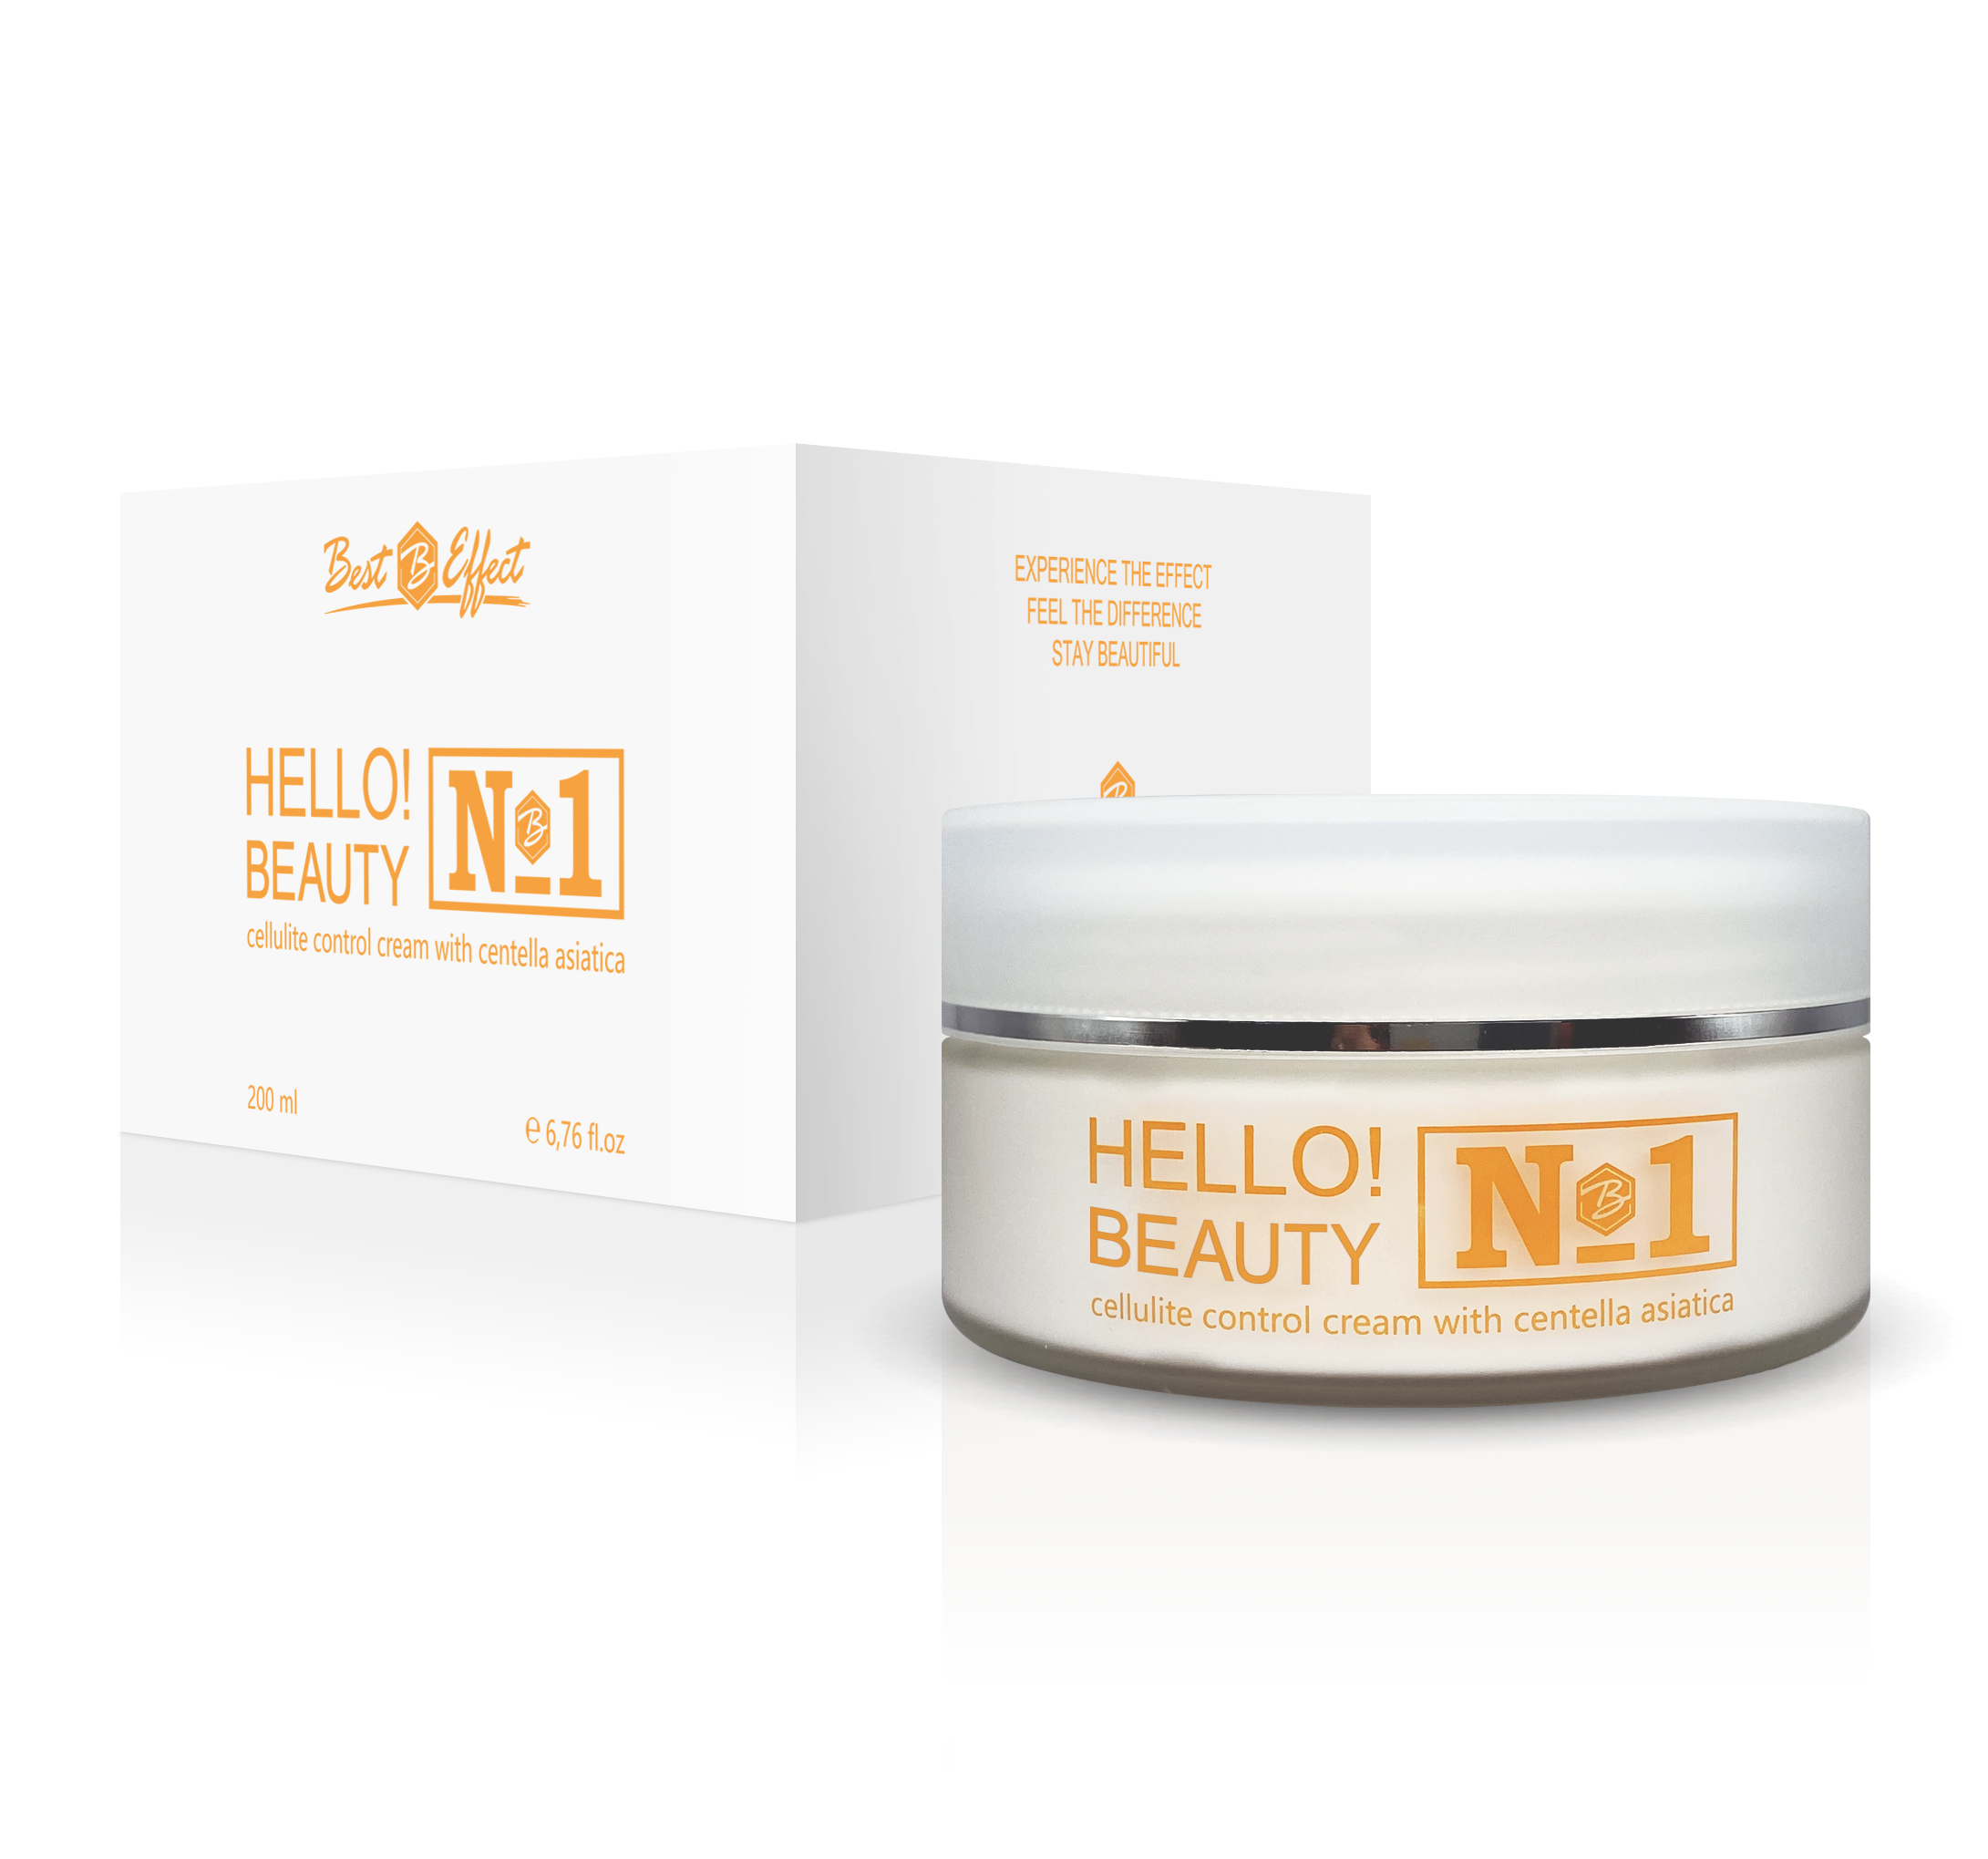 Hello!Beauty N1 cellulite control cream